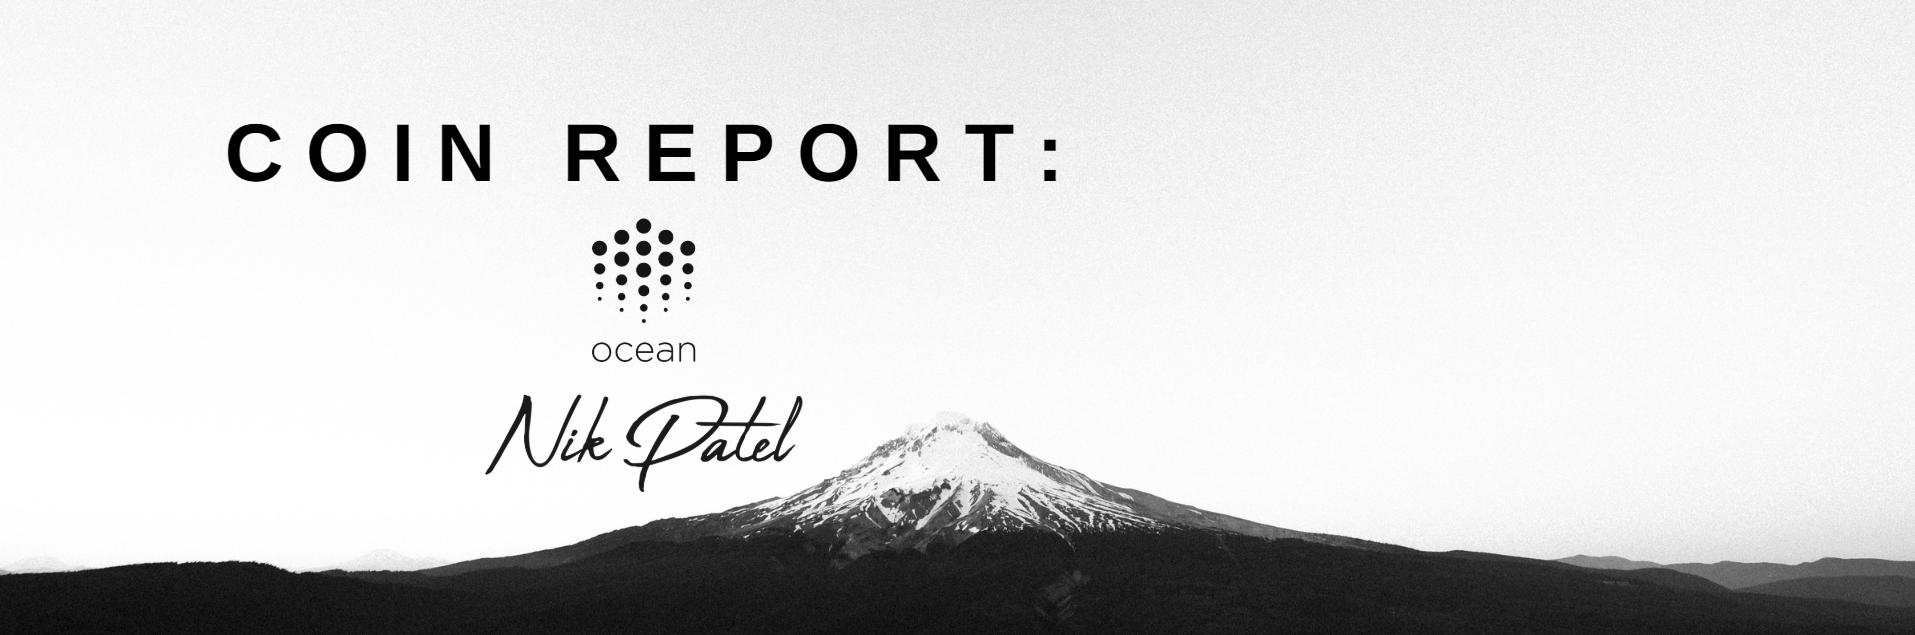 Coin Report #37: Ocean Protocol